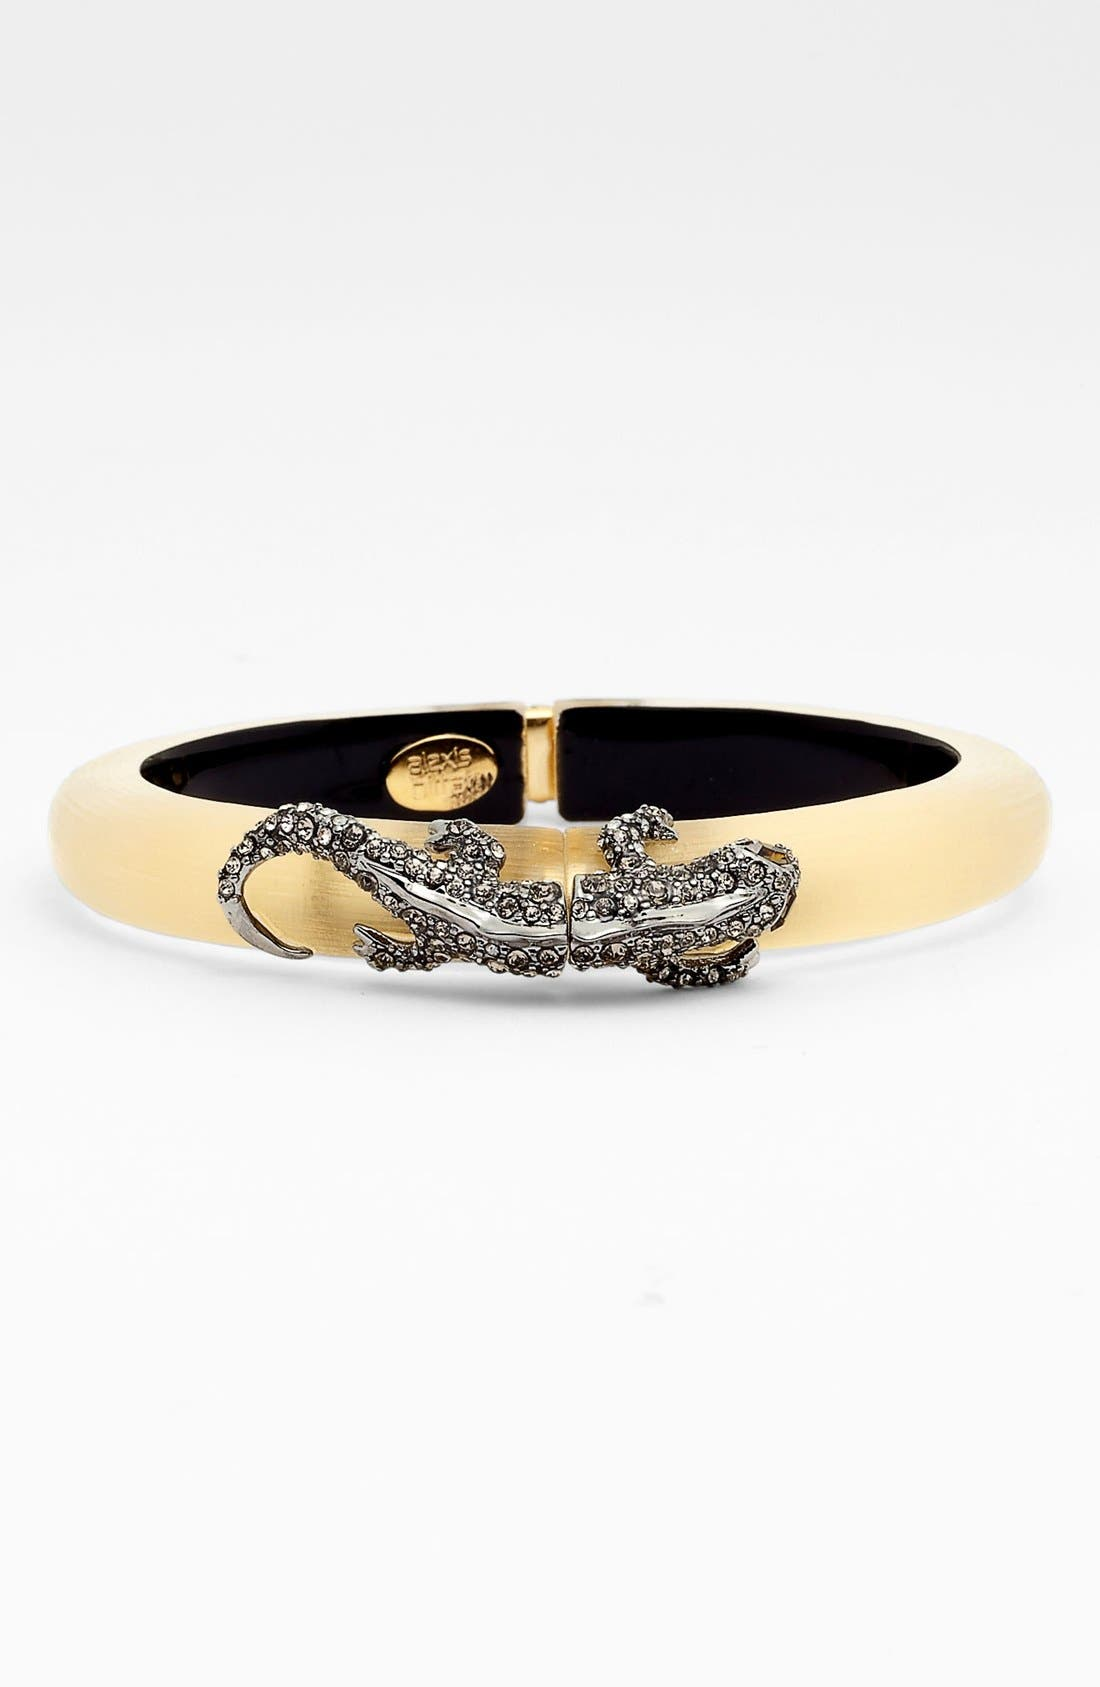 Alternate Image 1 Selected - Alexis Bittar 'Lucite® - Durban' Salamander Hinged Bracelet